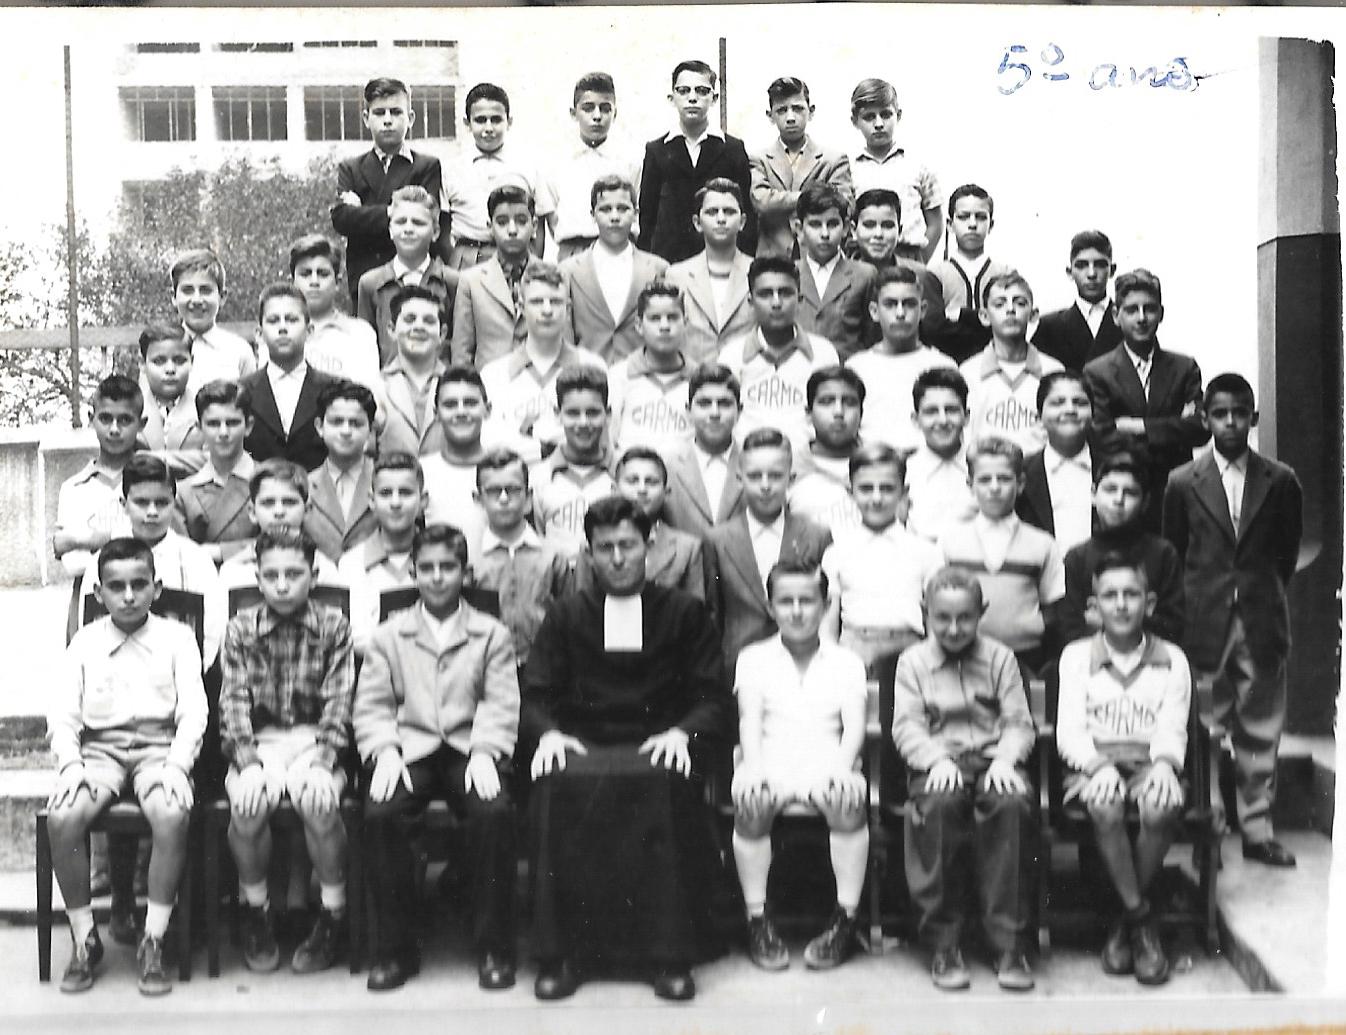 CARMO,Admissão,1956.jpg